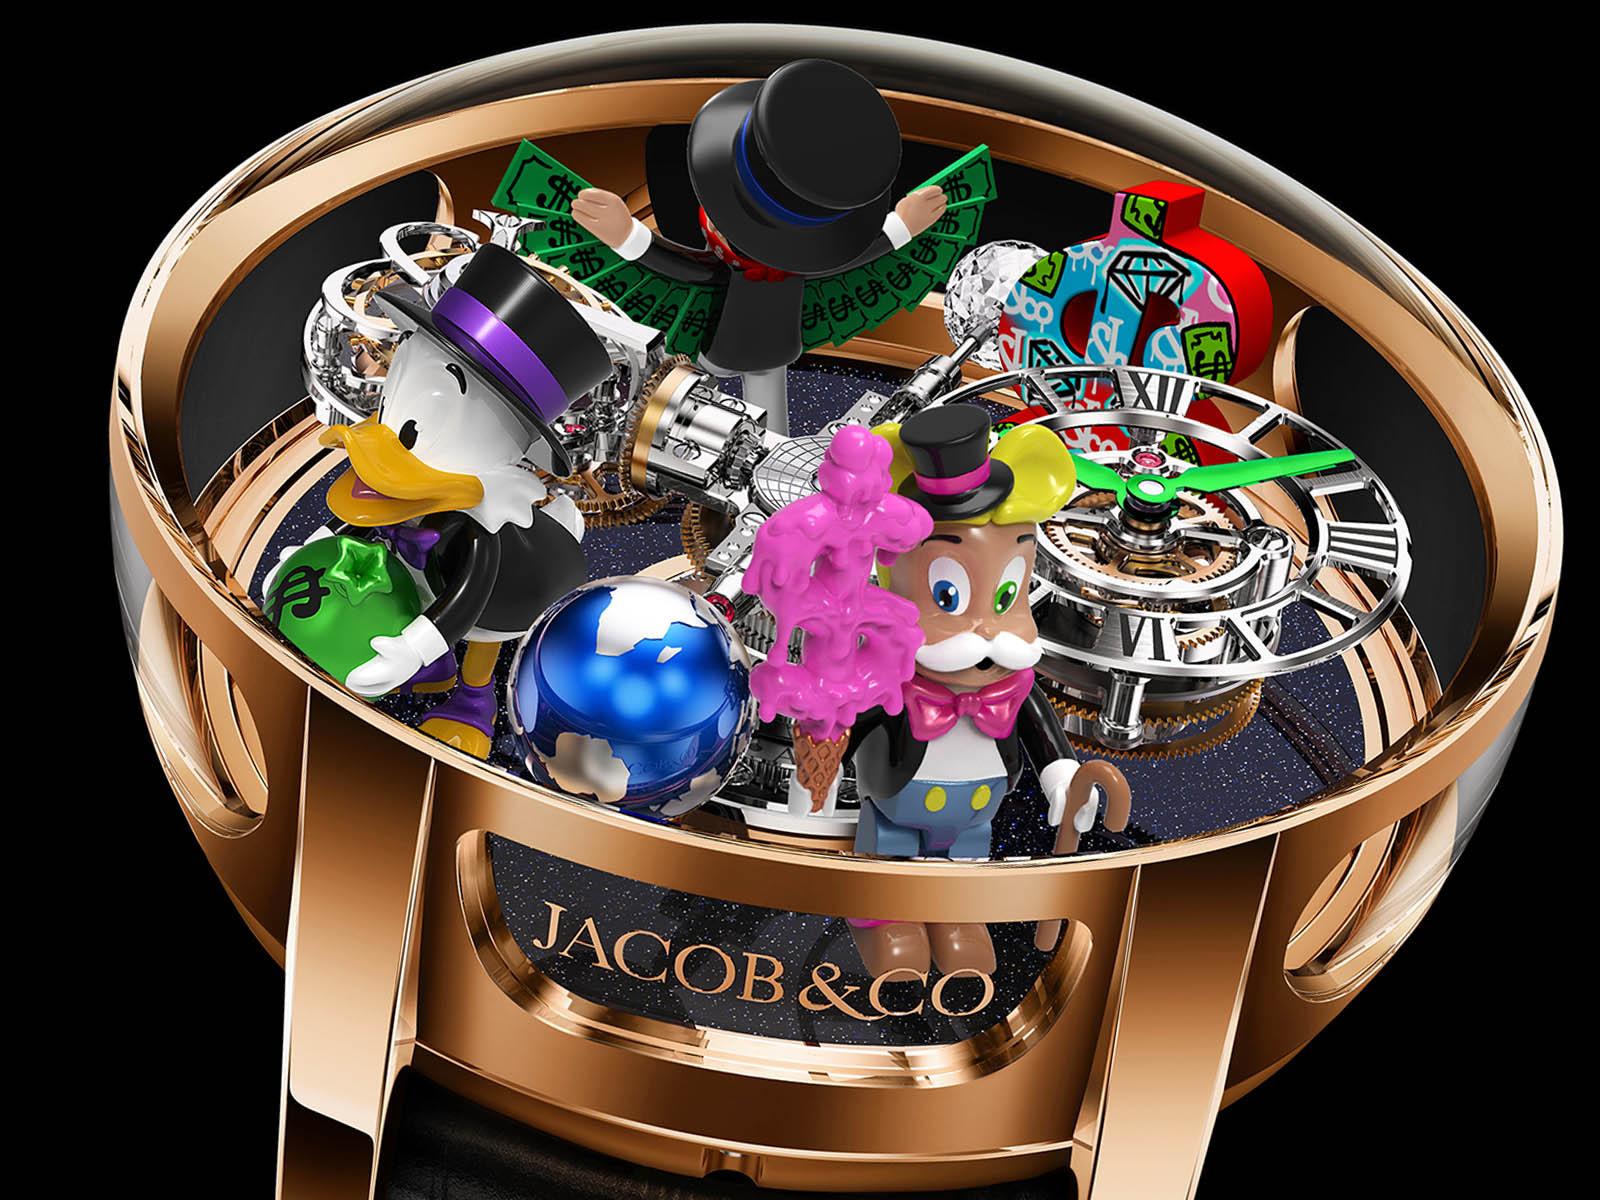 jacob-co-astronomia-alec-monopoly-2.jpg